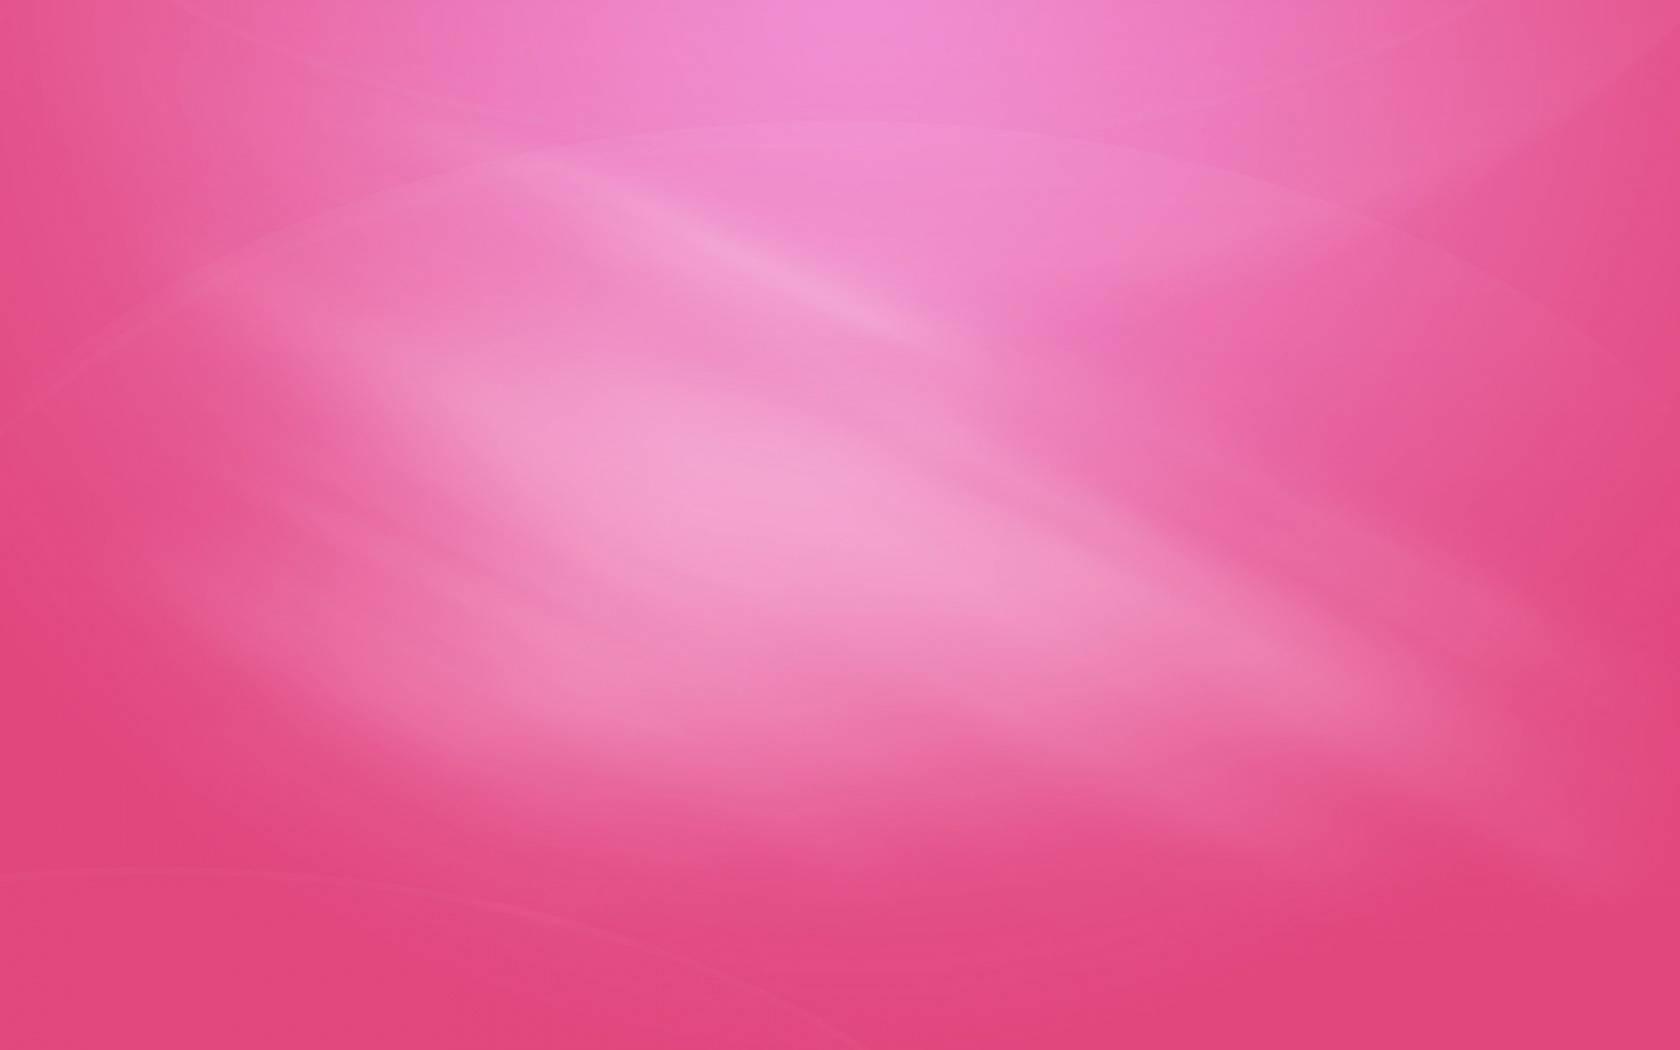 Background pink   Mwahs Beauty Secrets Wallpaper 1680x1050